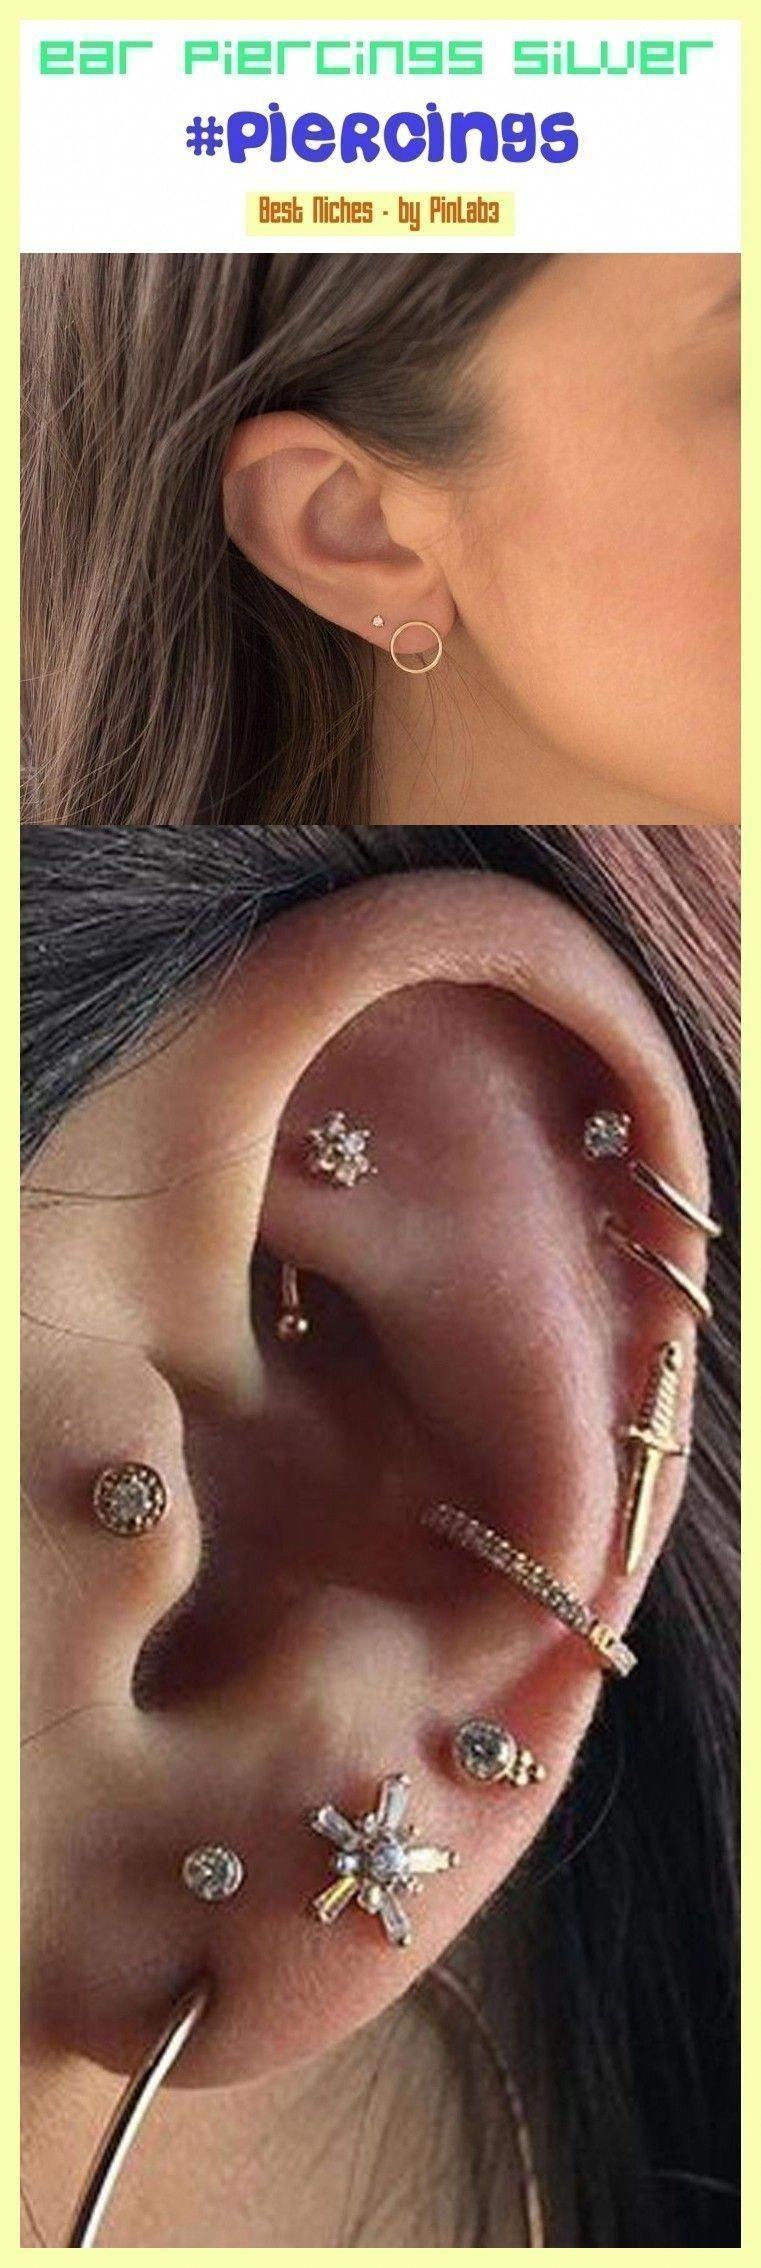 Temporary tattoos multiple ear piercings pretty m